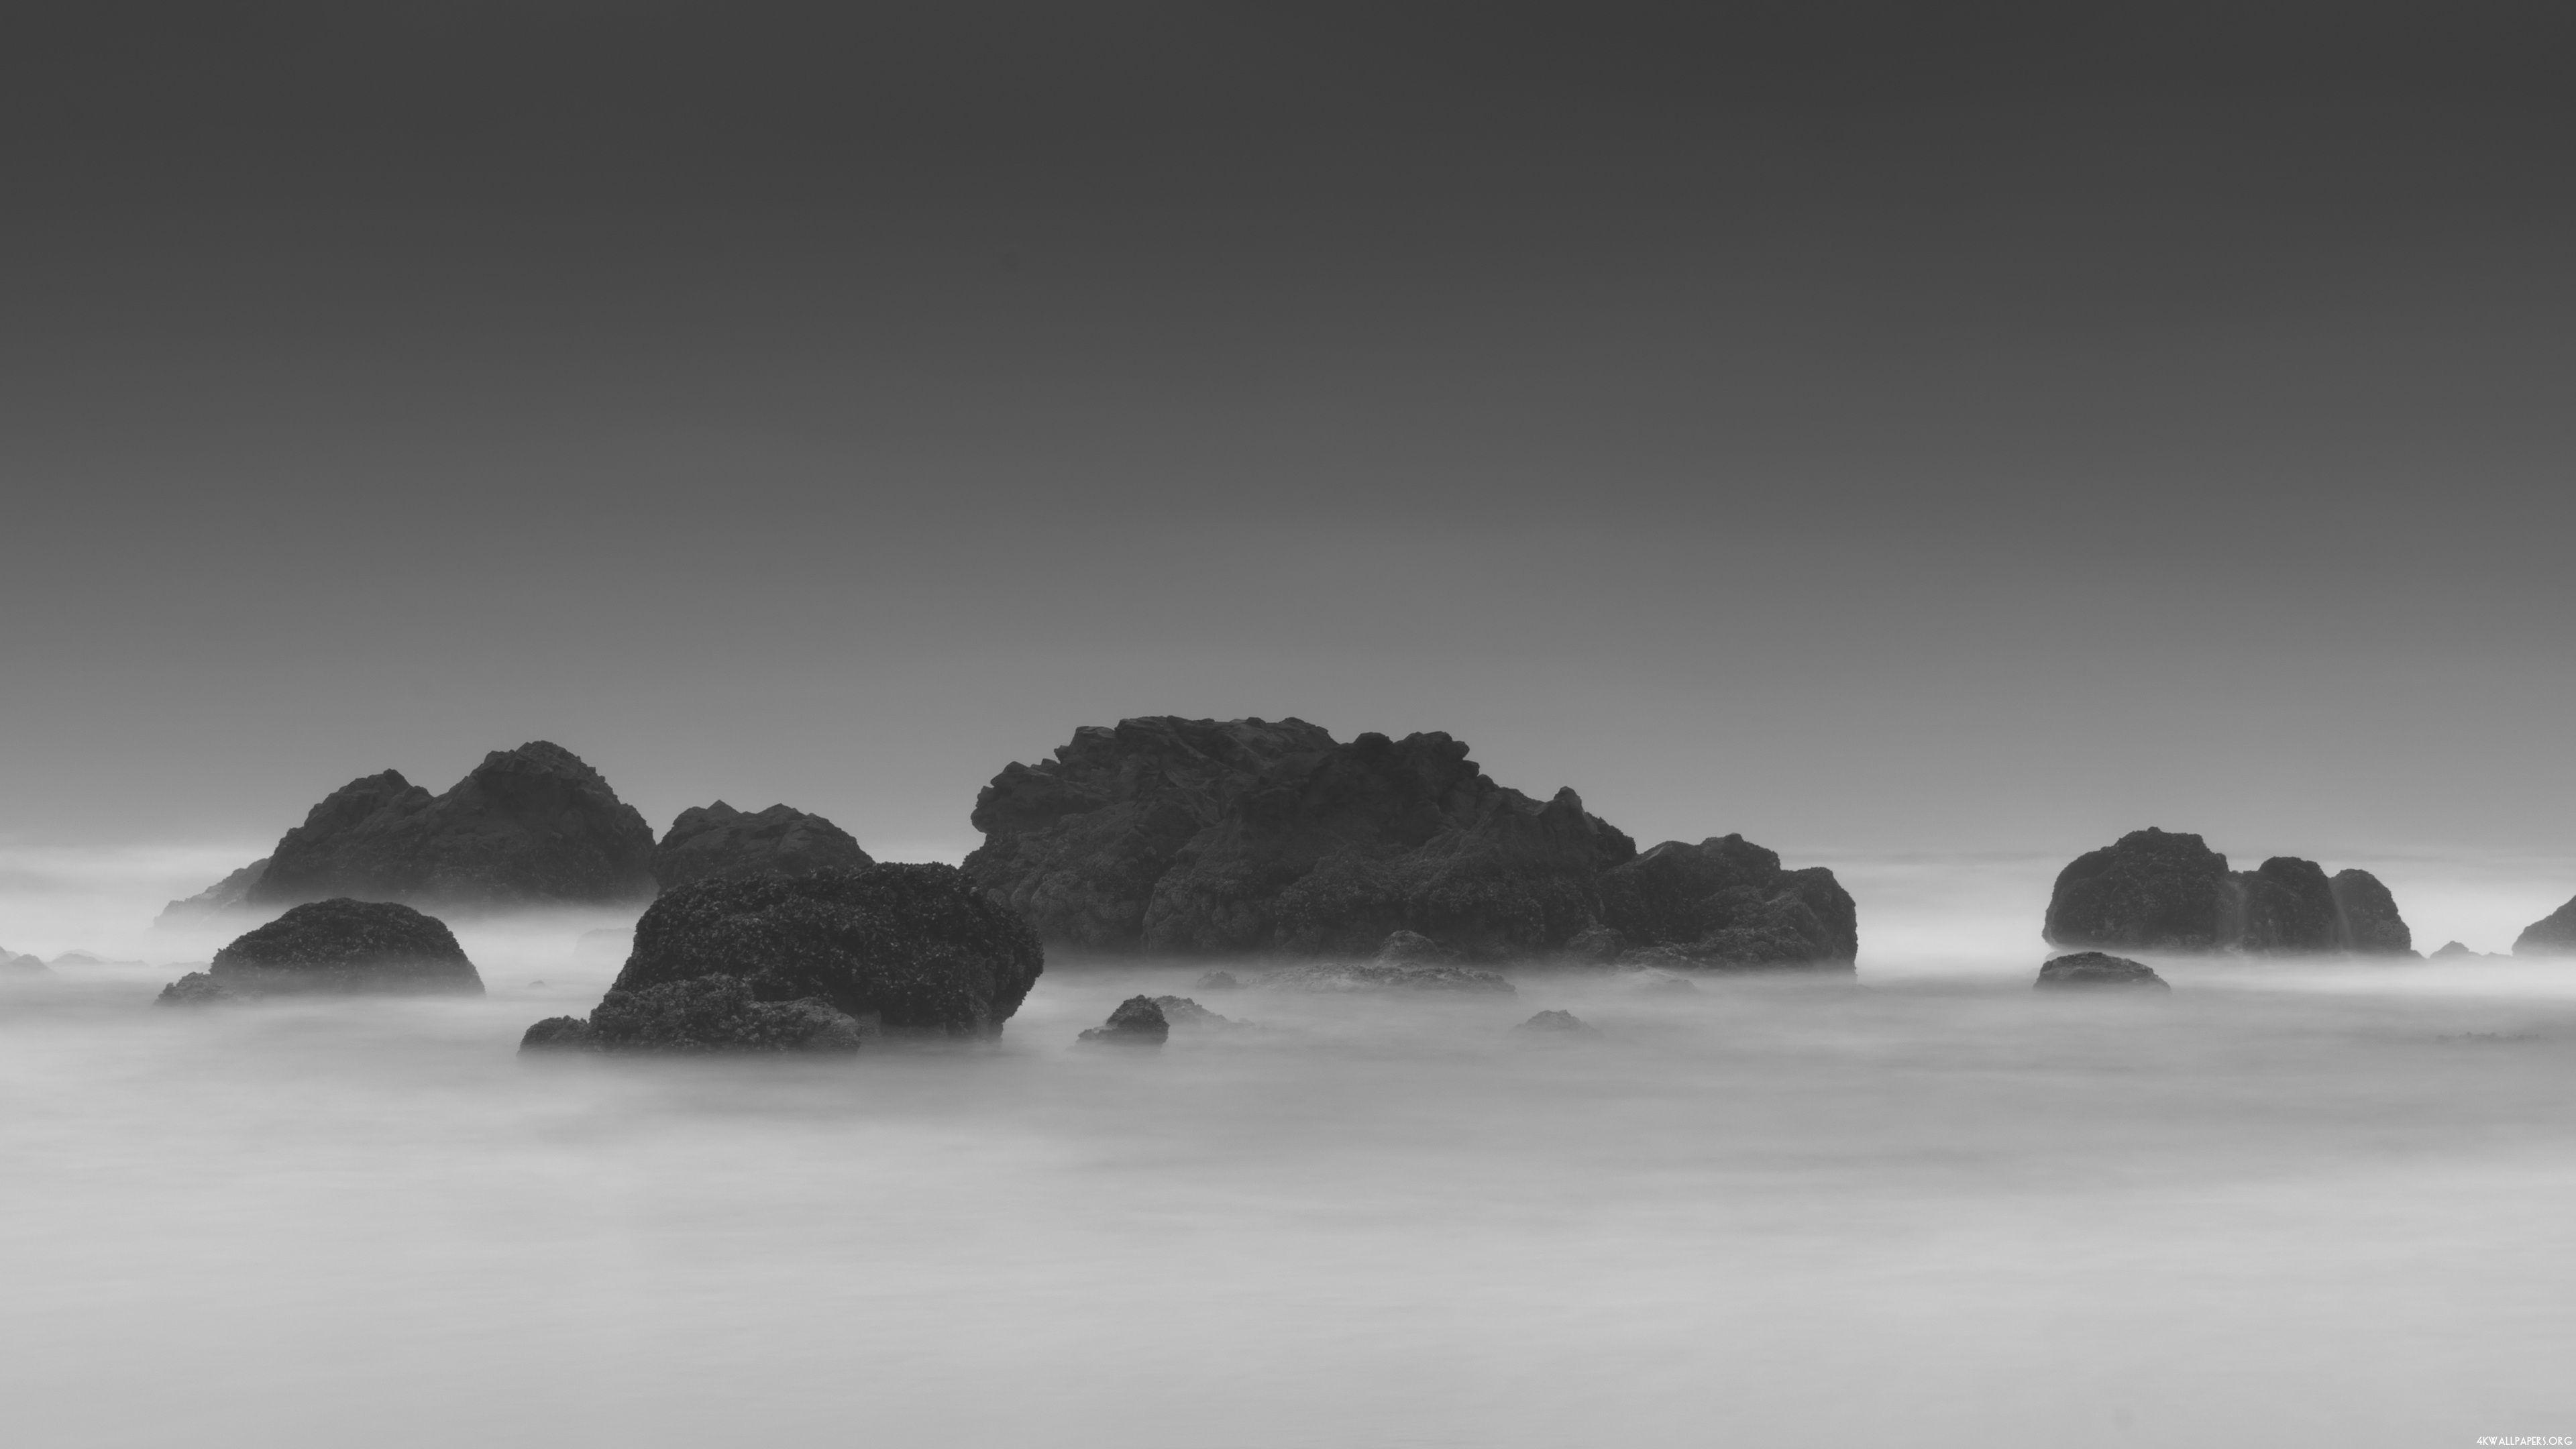 4K Grey Wallpapers - Top Free 4K Grey Backgrounds ...